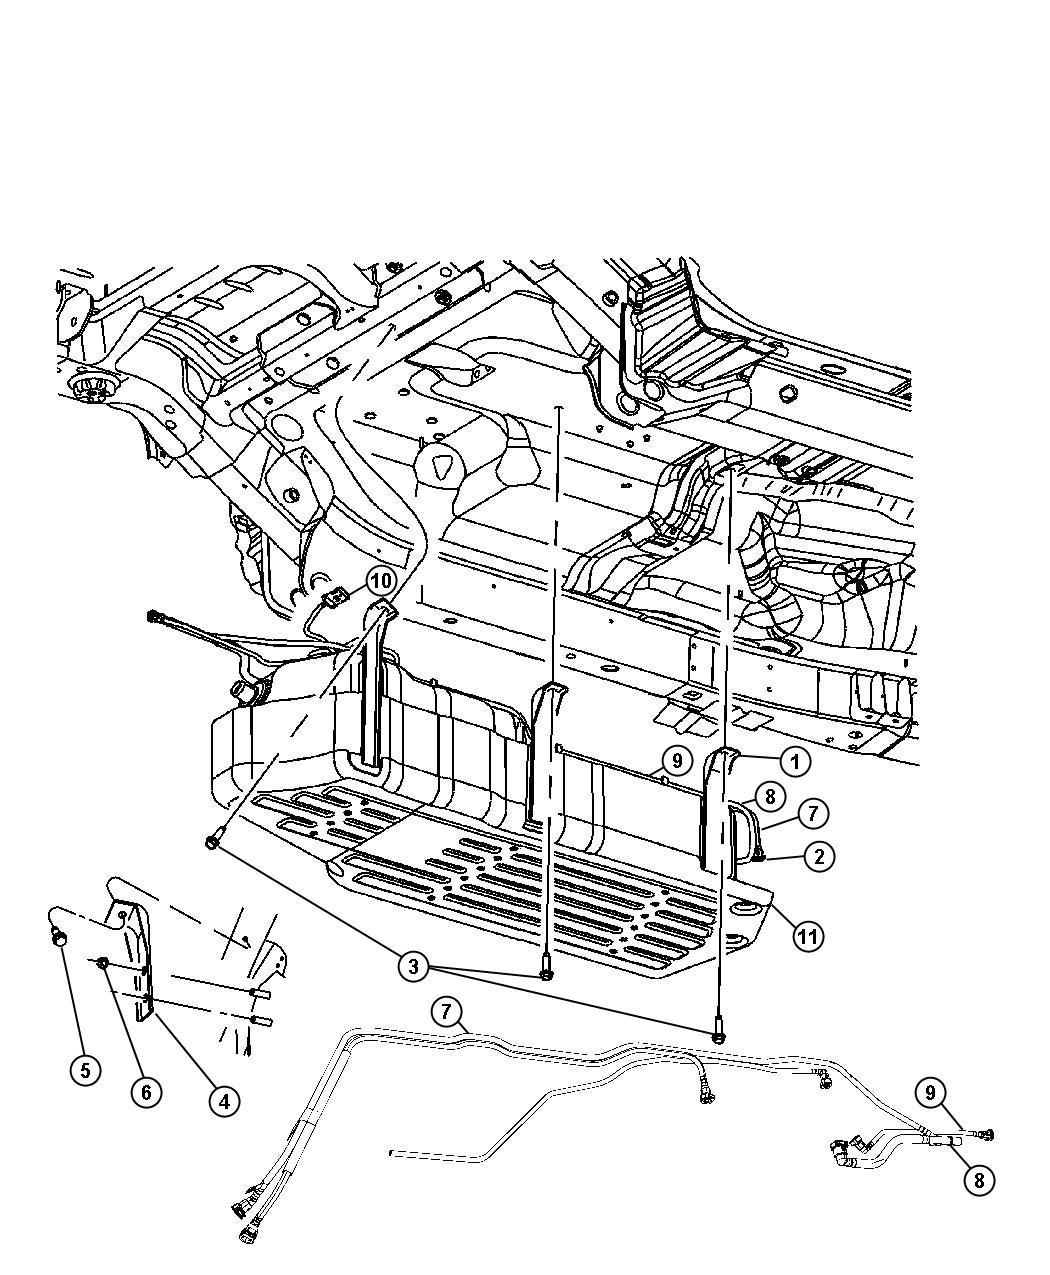 Dodge Grand Caravan Skid Plate Fuel Tank Fuel Tank Skid